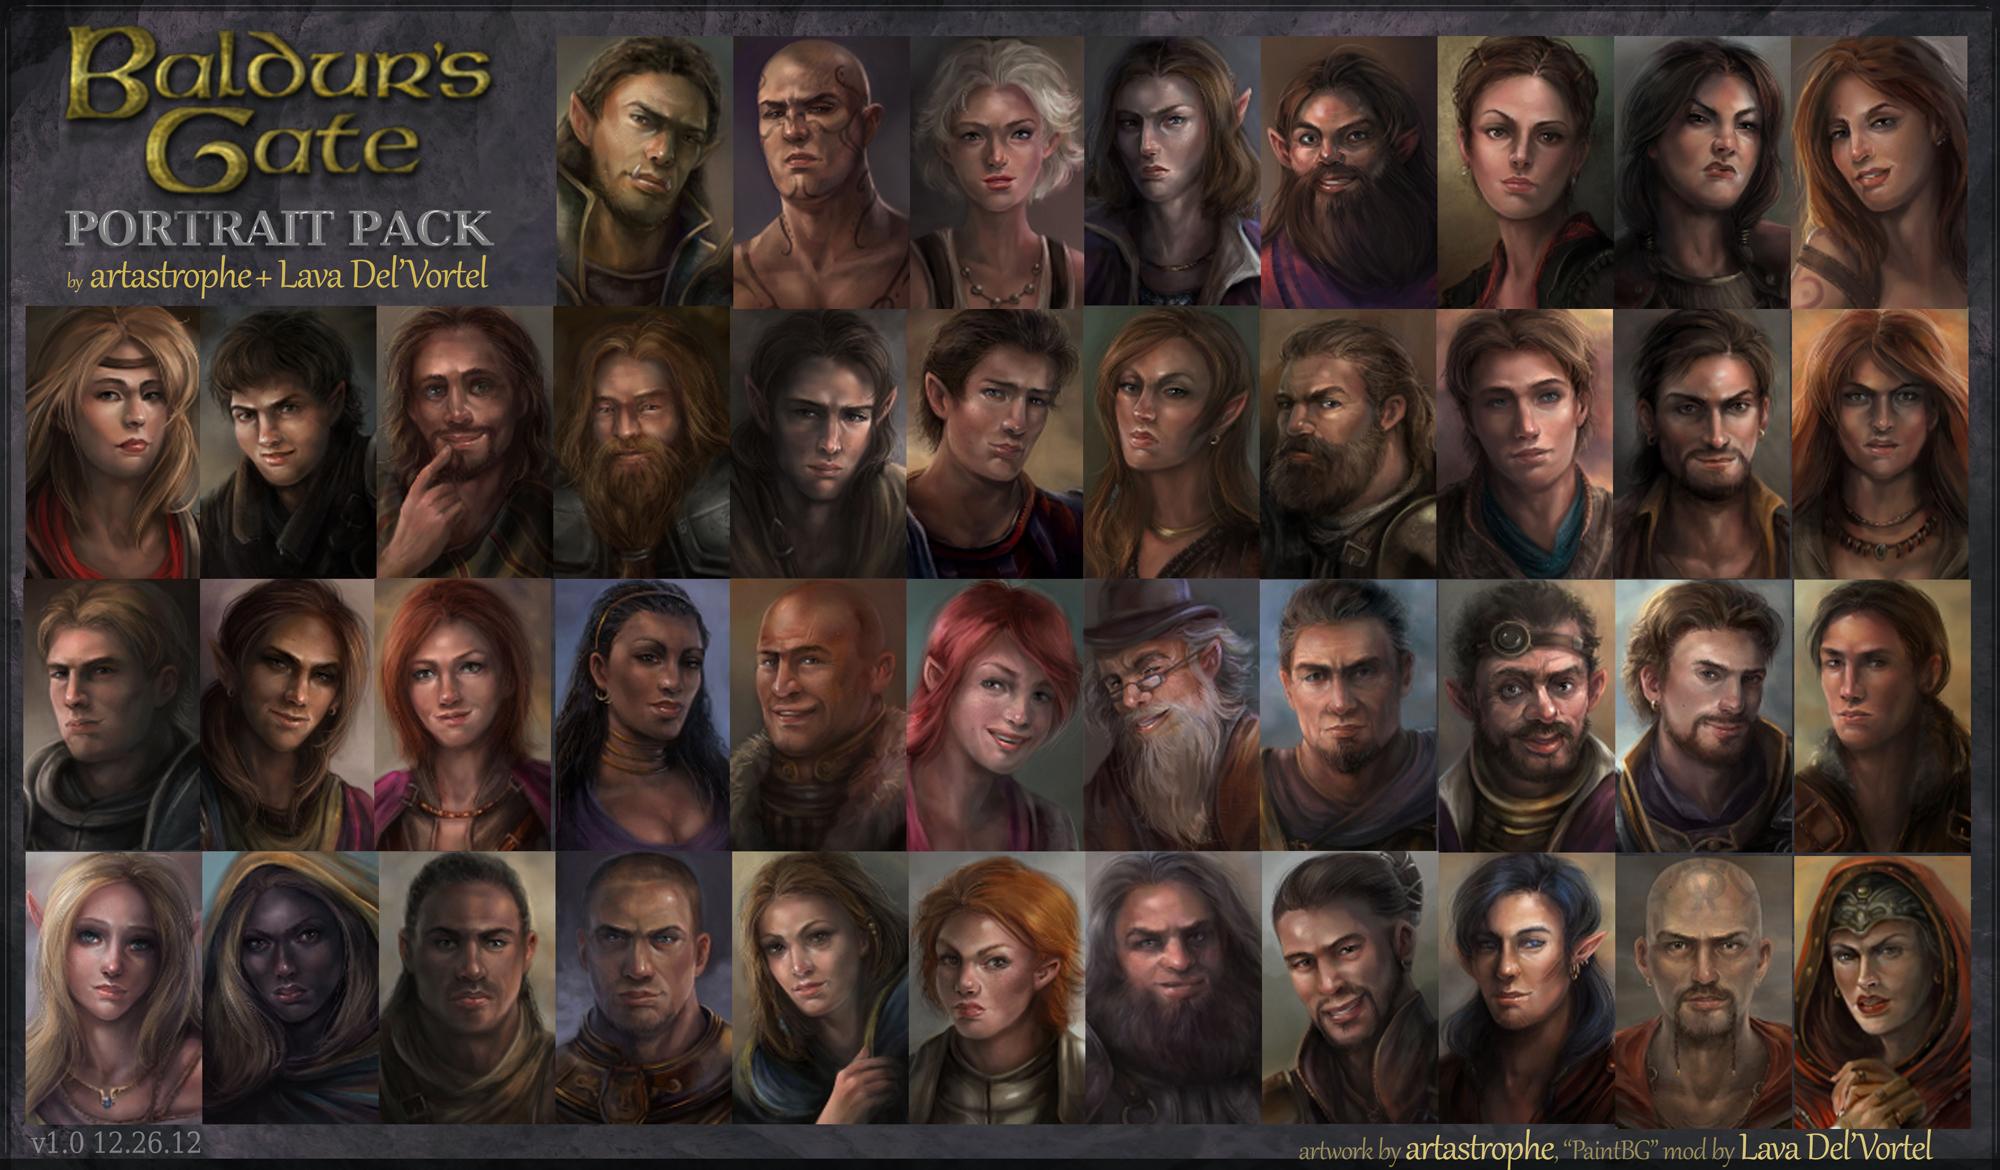 Baldur's Gate NPC Portraits